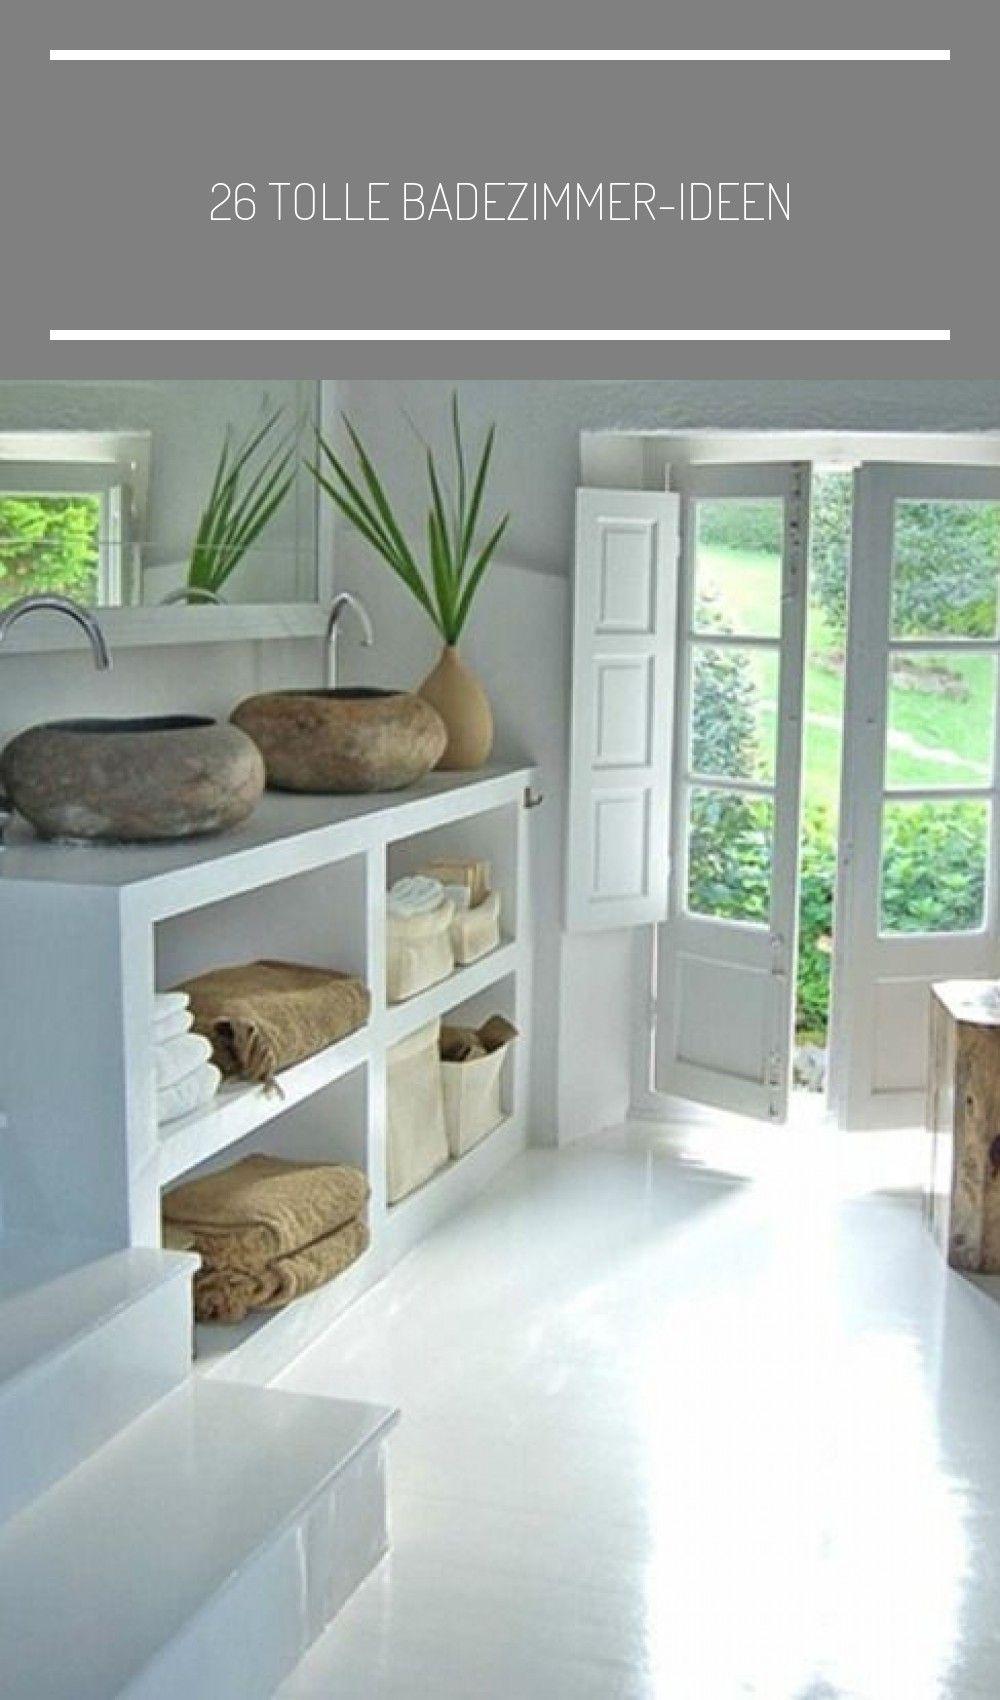 26 Tolle Badezimmer Ideen Amazing Bathrooms Bathroom Vanity Style Top Bathroom Design